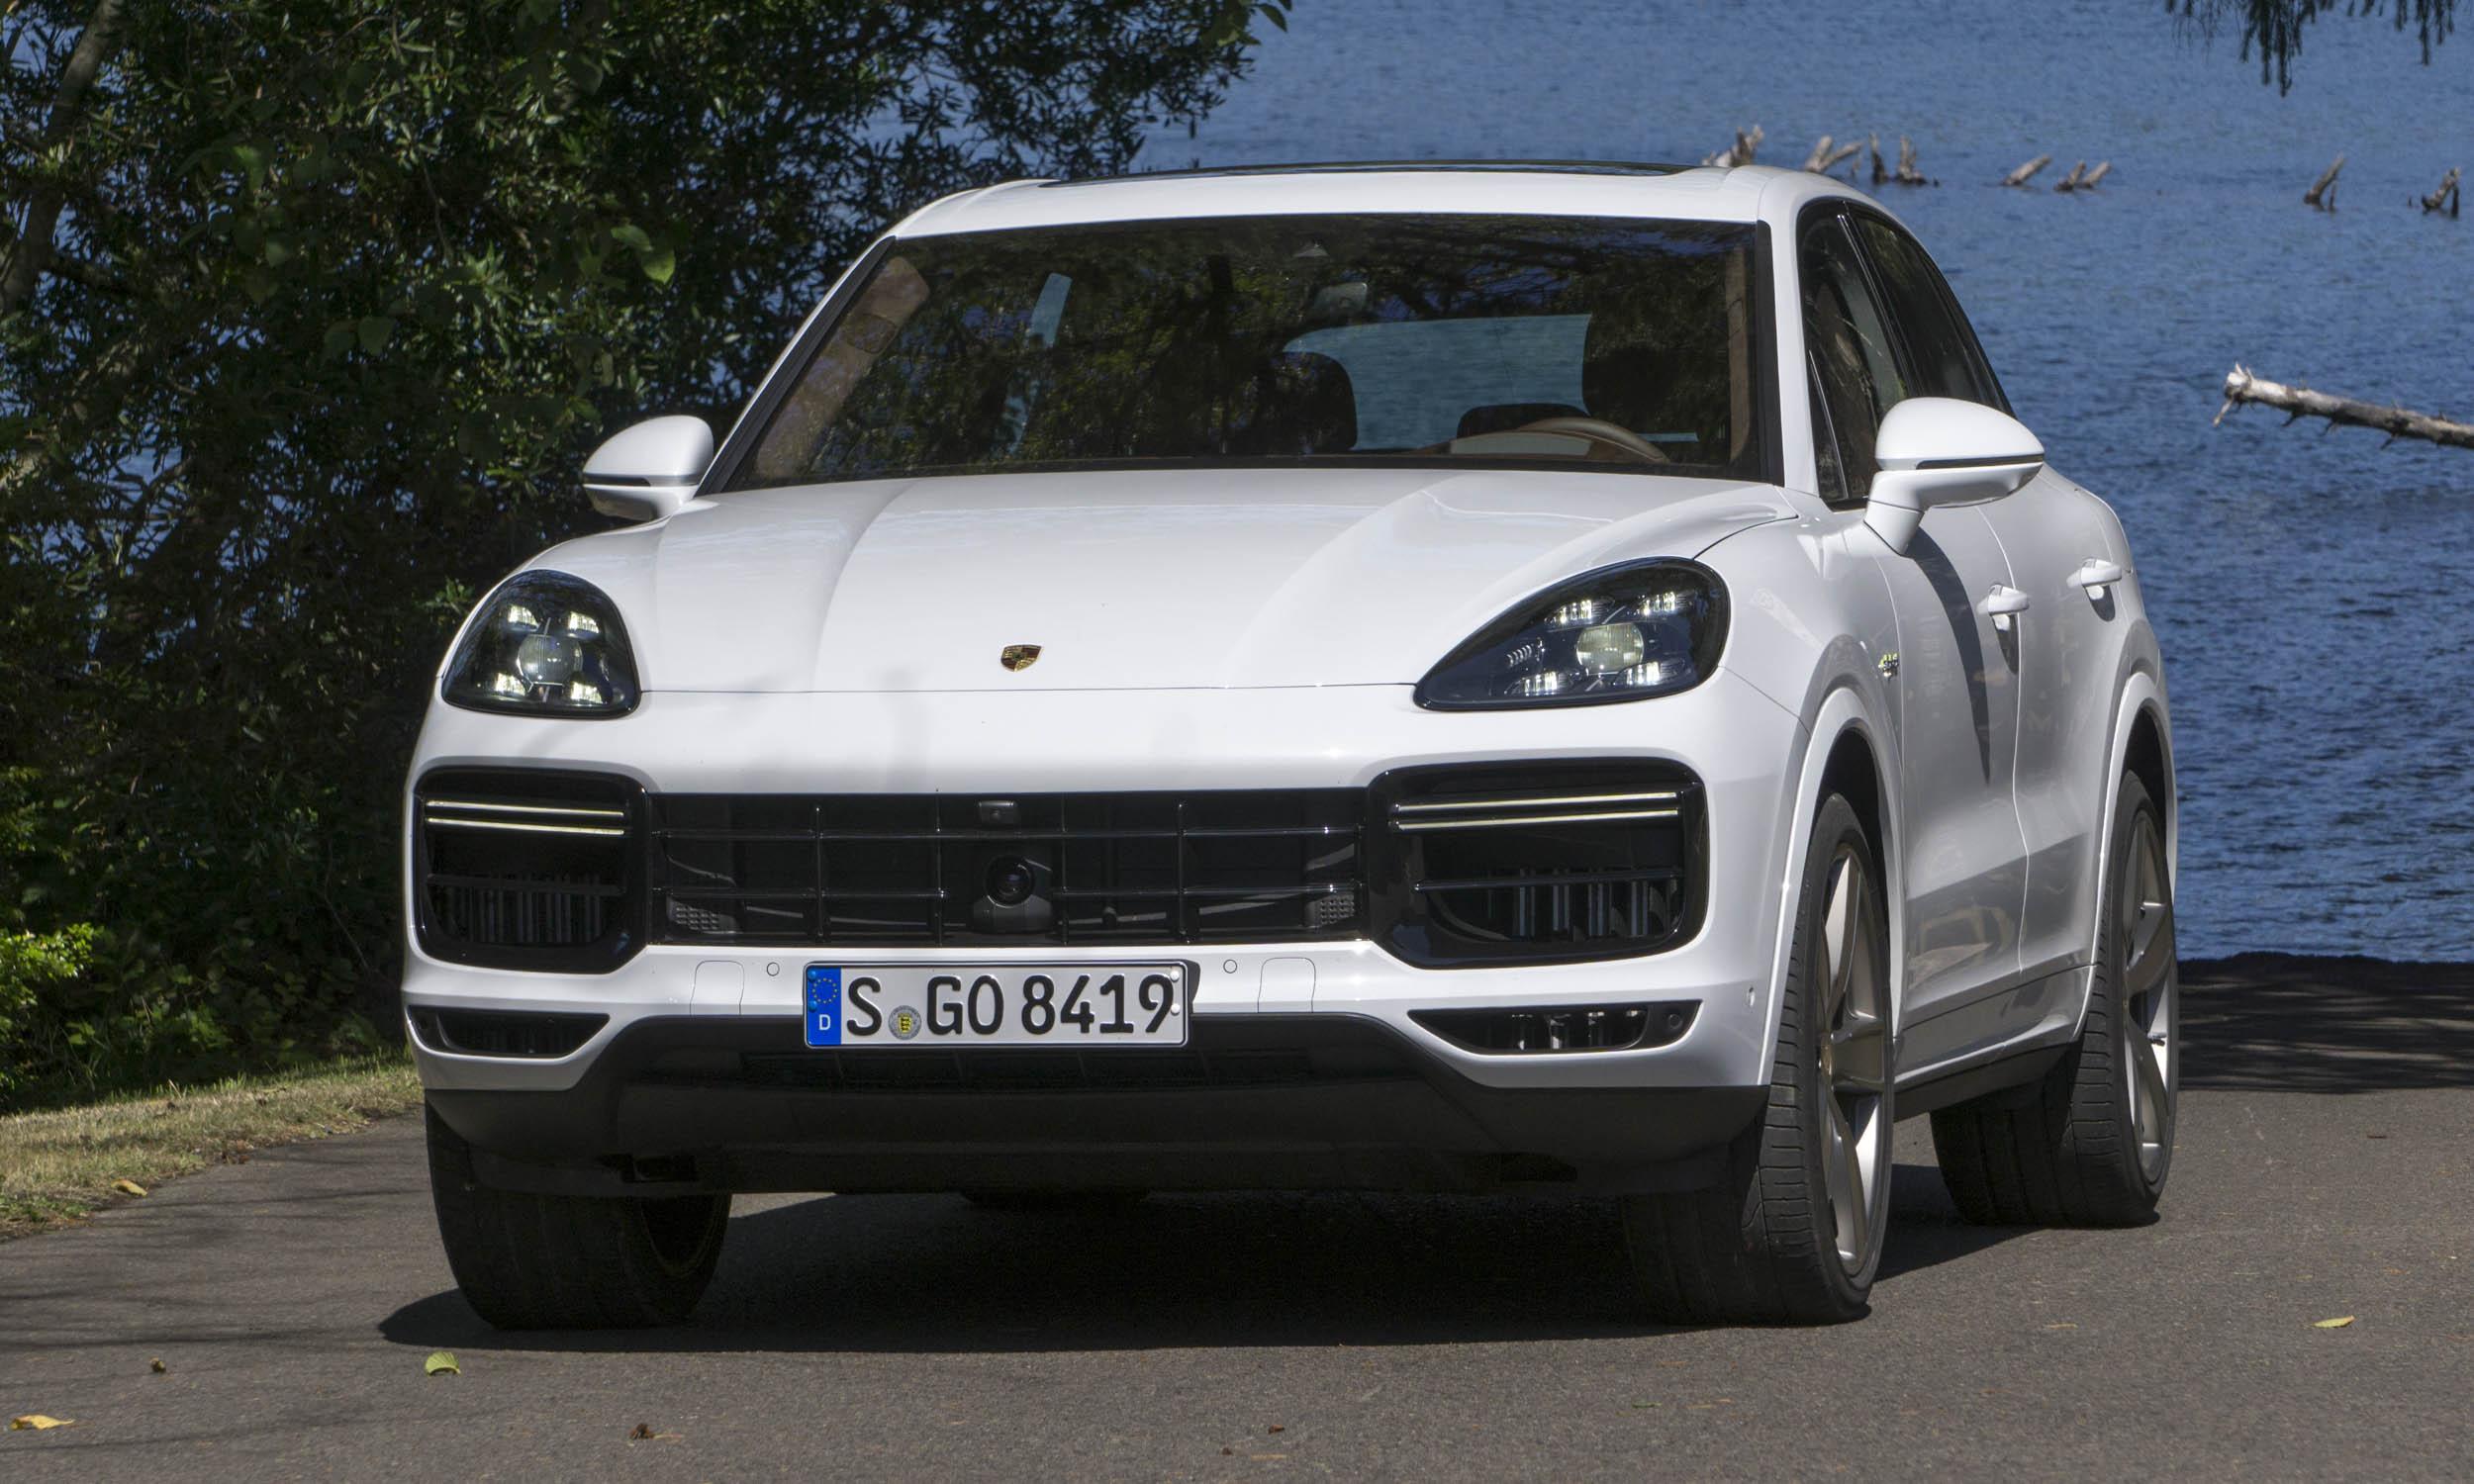 Cayenne Turbo S >> 2020 Porsche Cayenne Turbo S E Hybrid First Drive Review